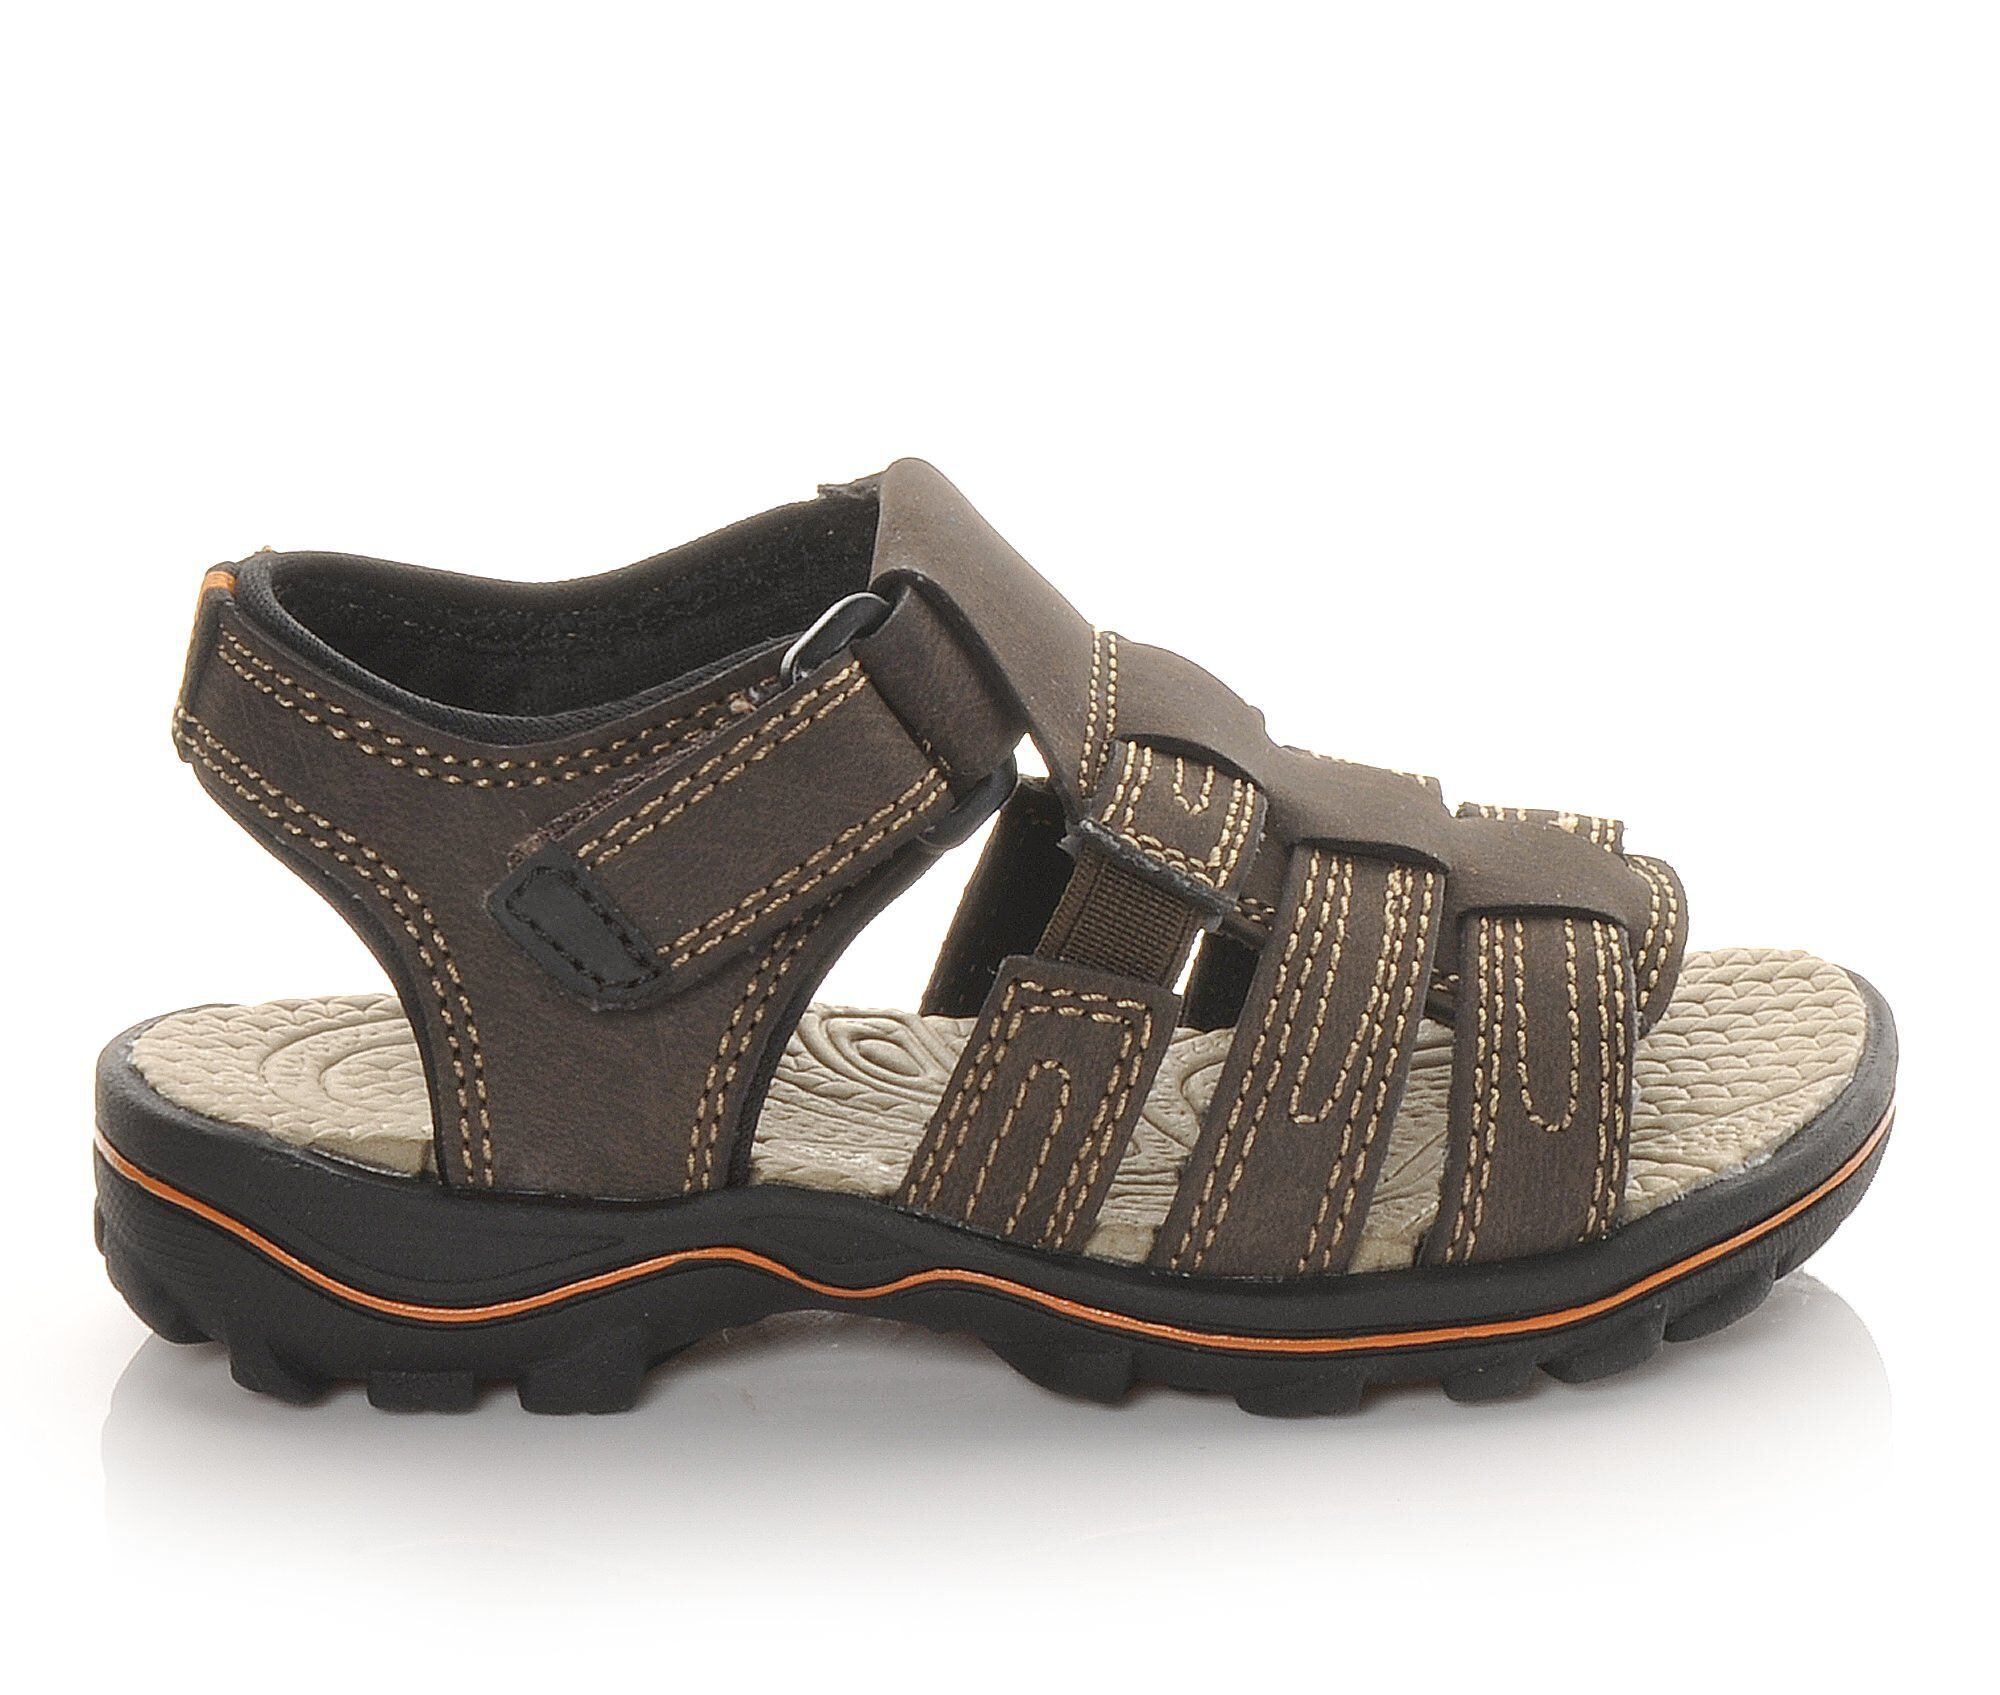 Boys Beaver Creek Infant Lake 510 Sandals